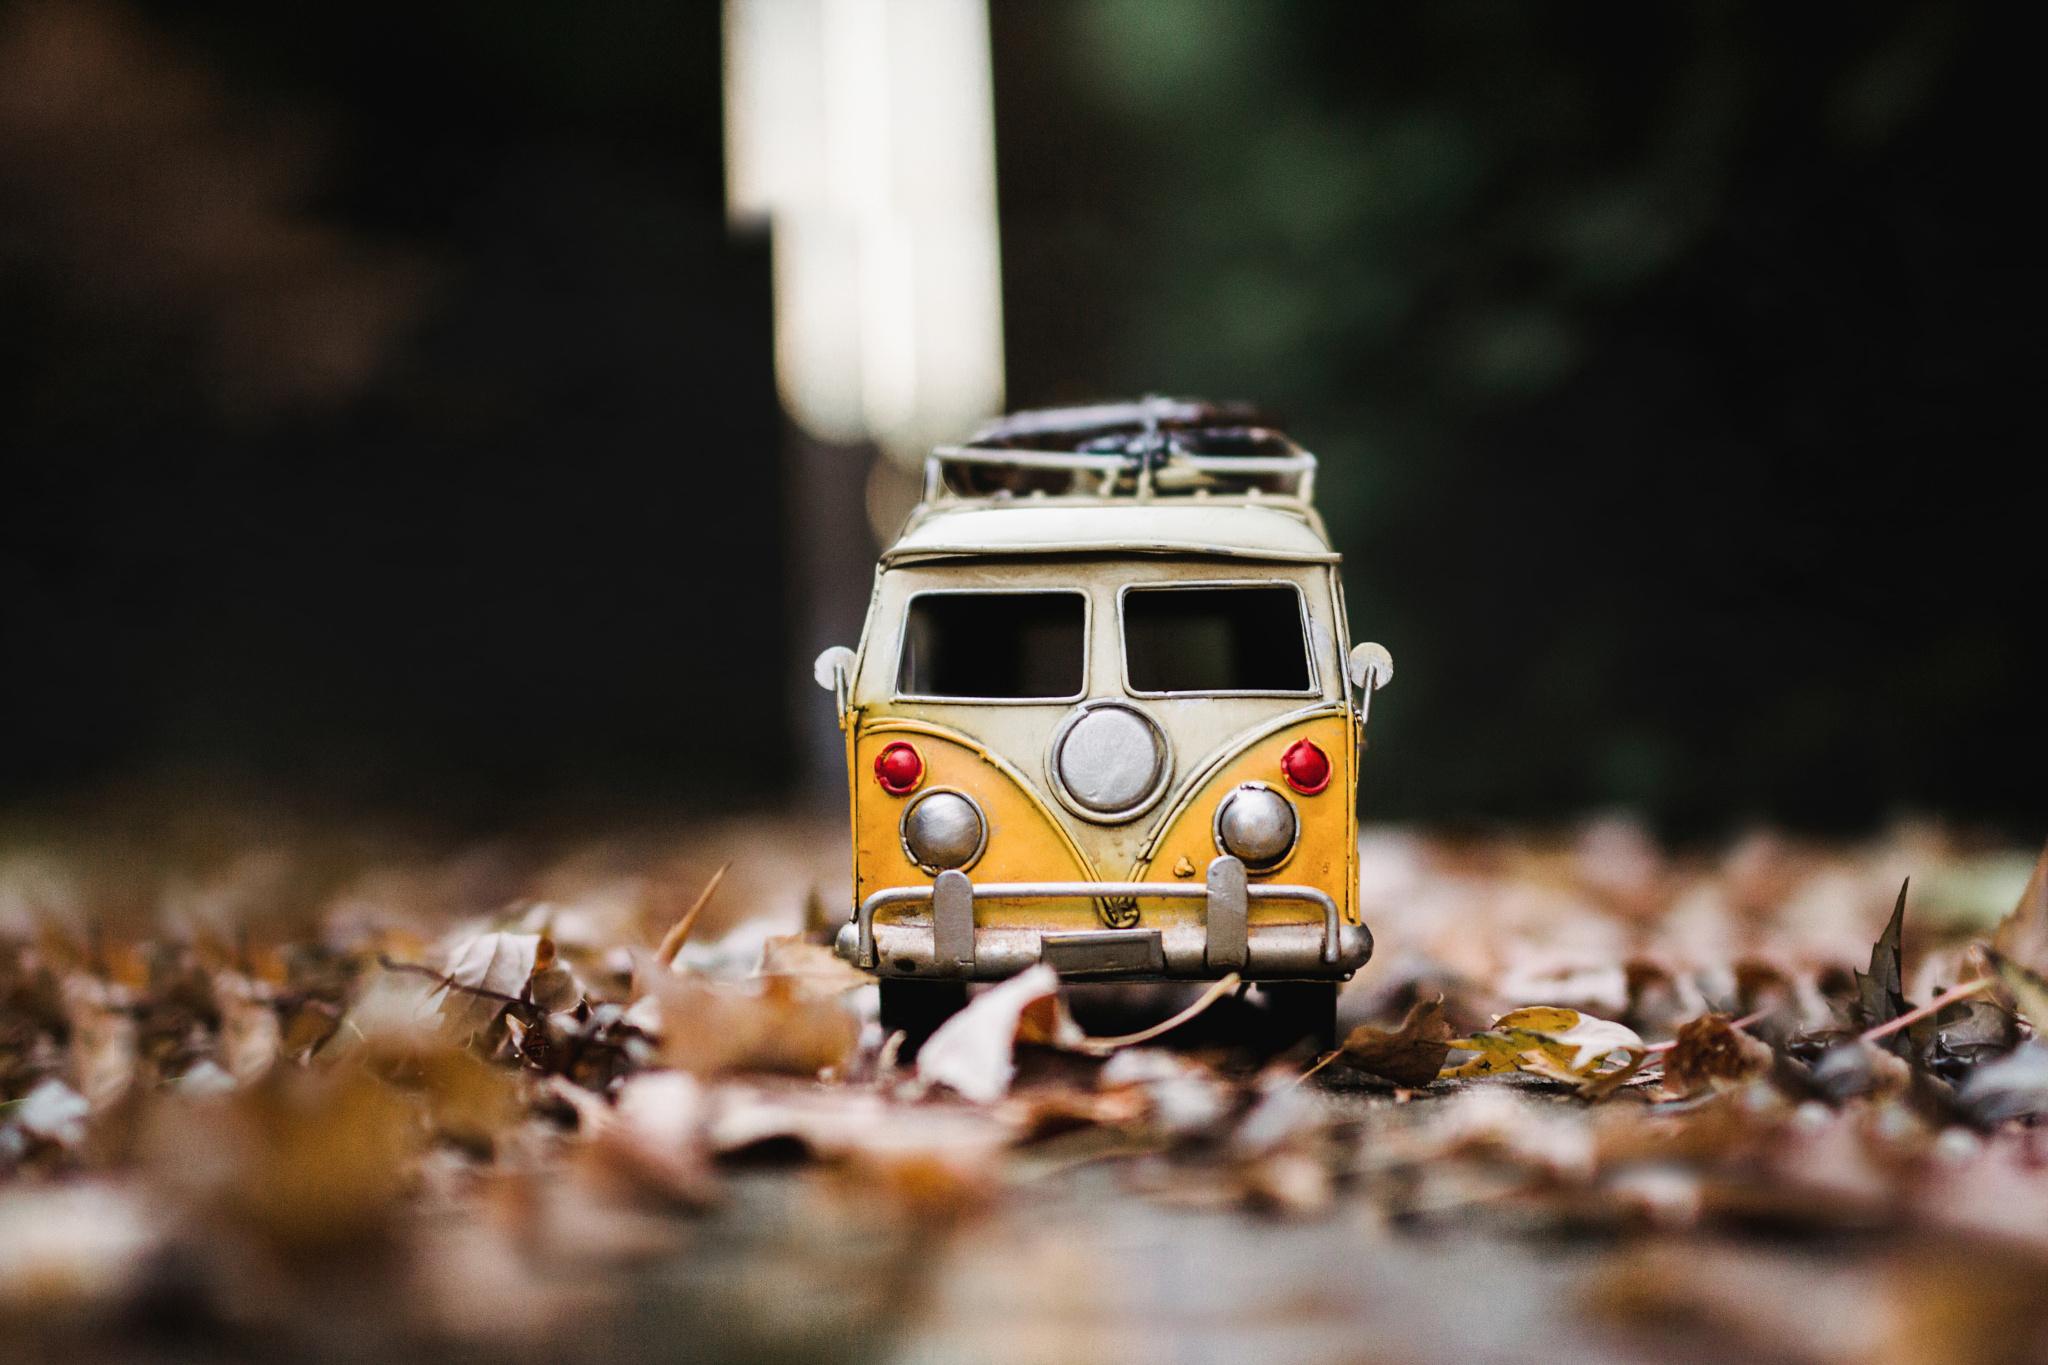 Pair Of Cute Toys Hd Wallpaper: Jouet Full HD Fond D'écran And Arrière-Plan